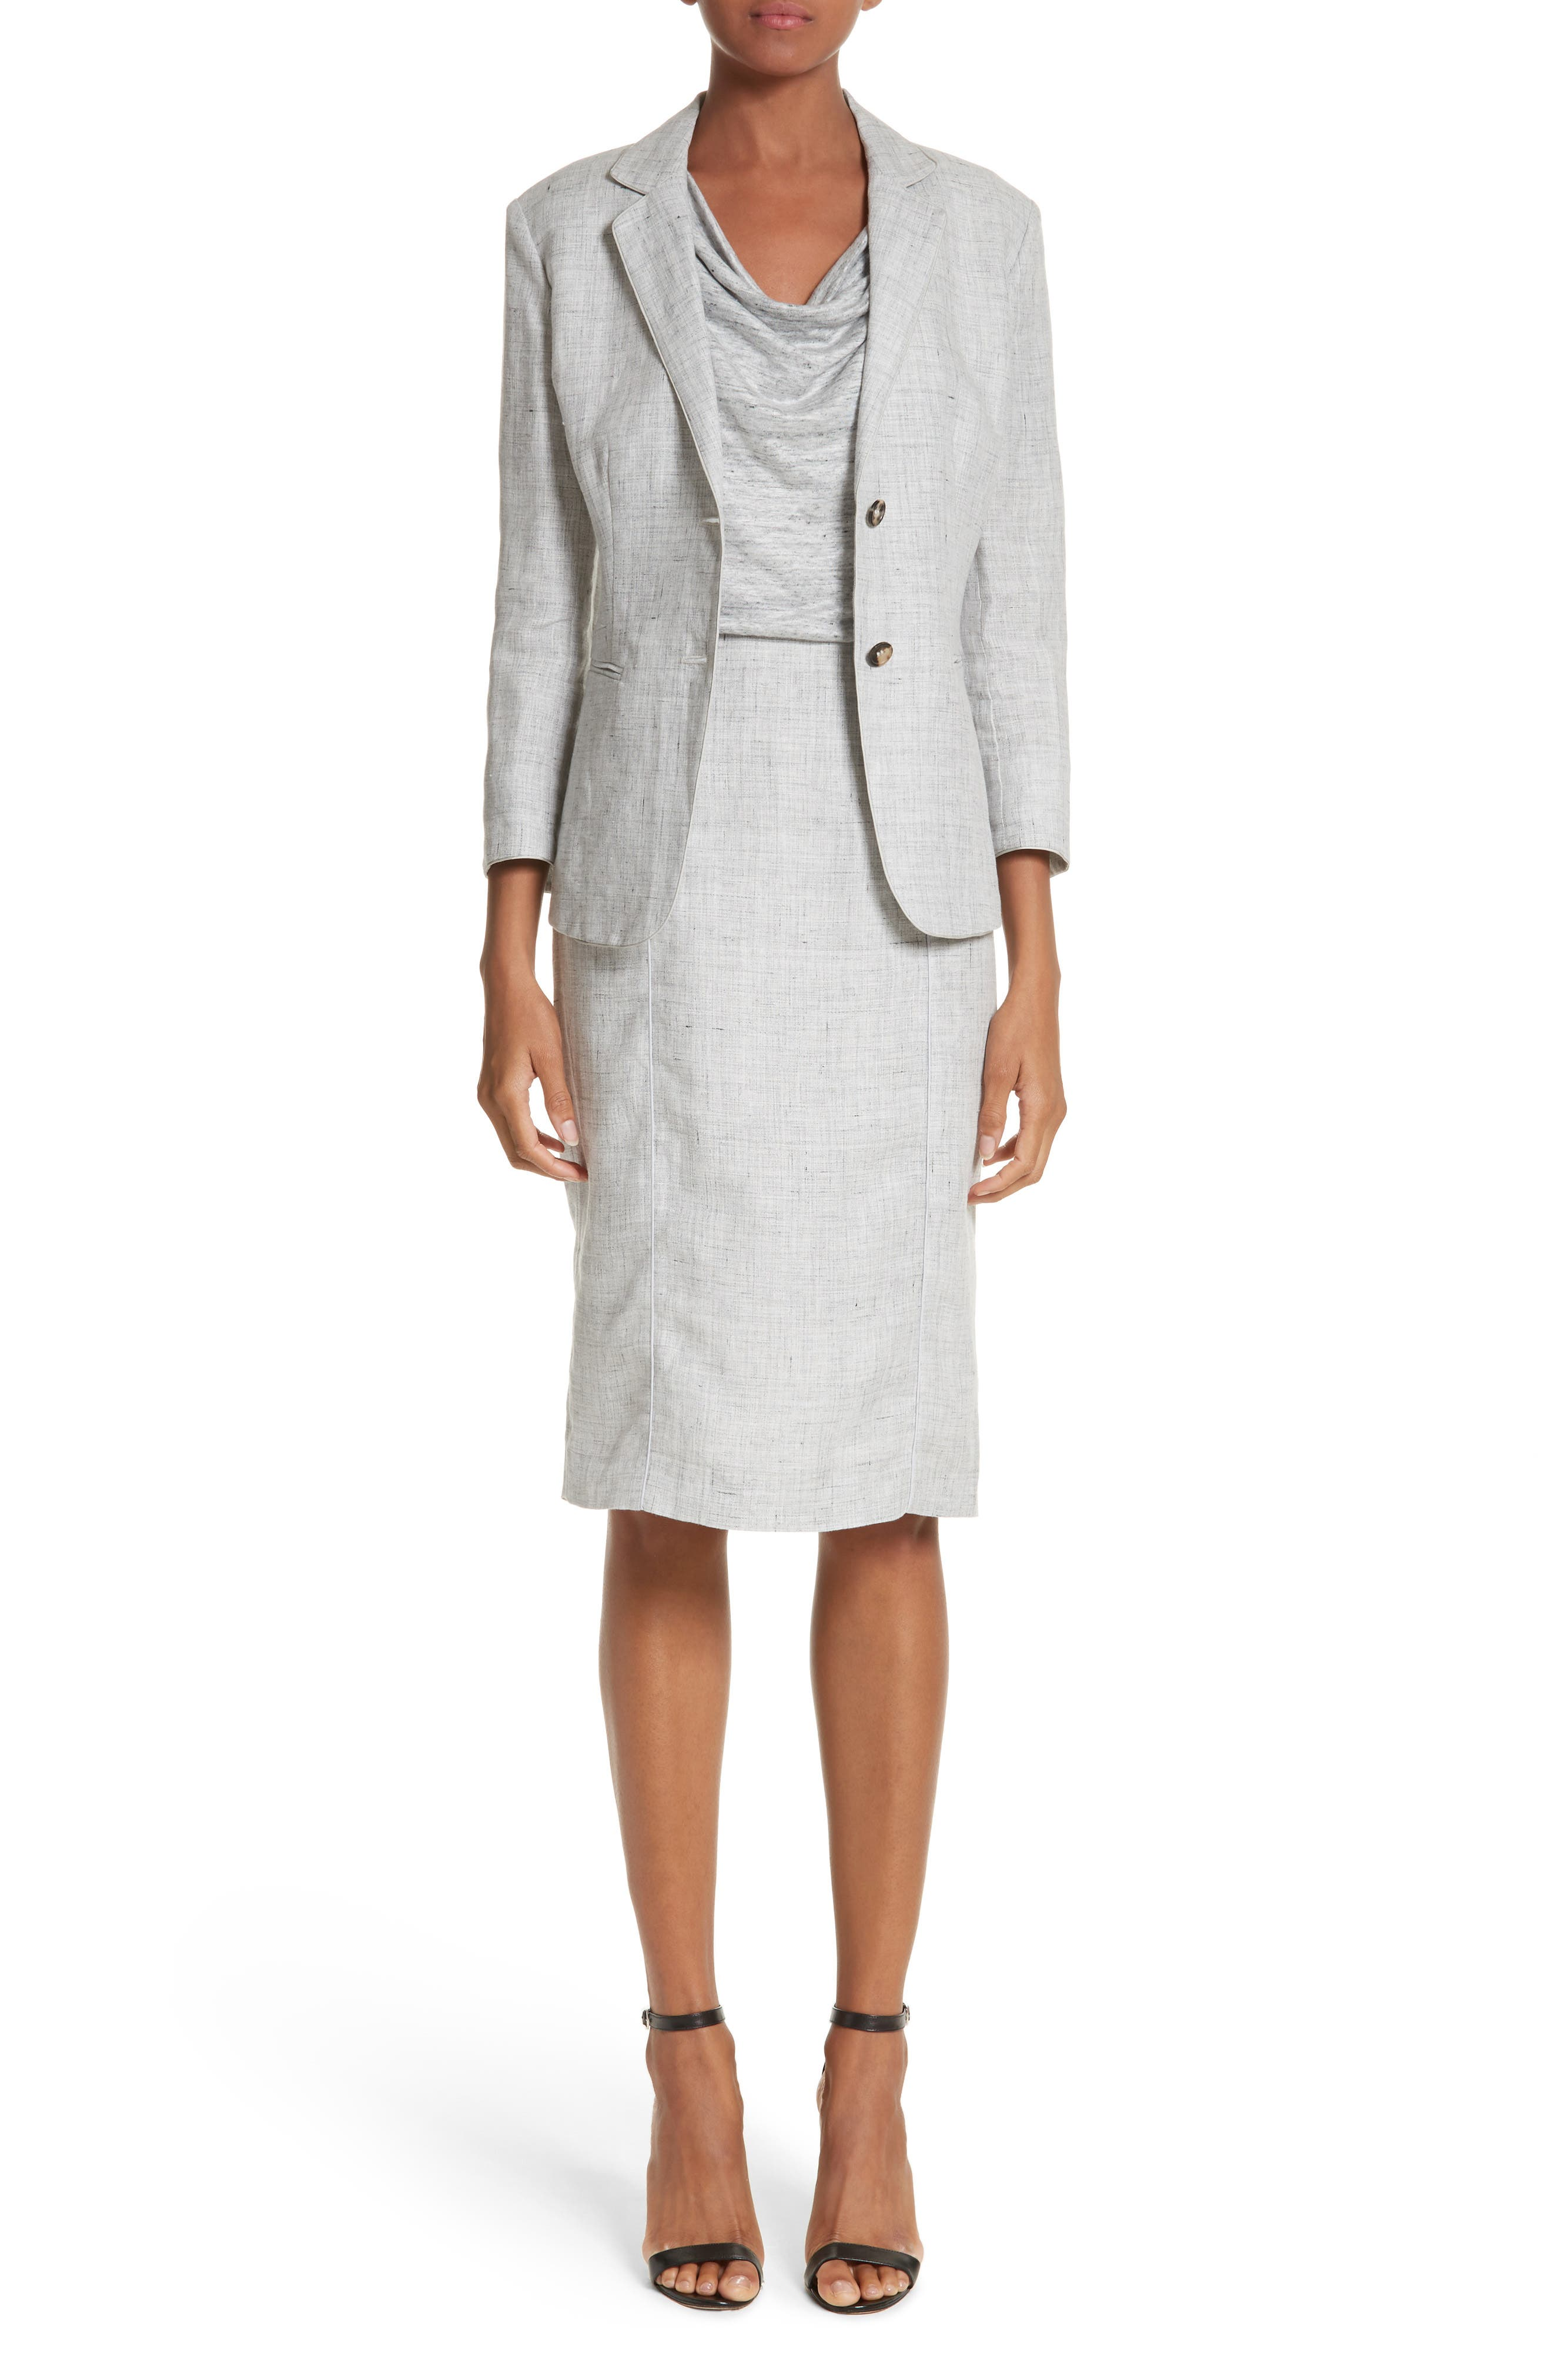 Laura Cowl Neck Linen Dress,                             Alternate thumbnail 7, color,                             Light Grey